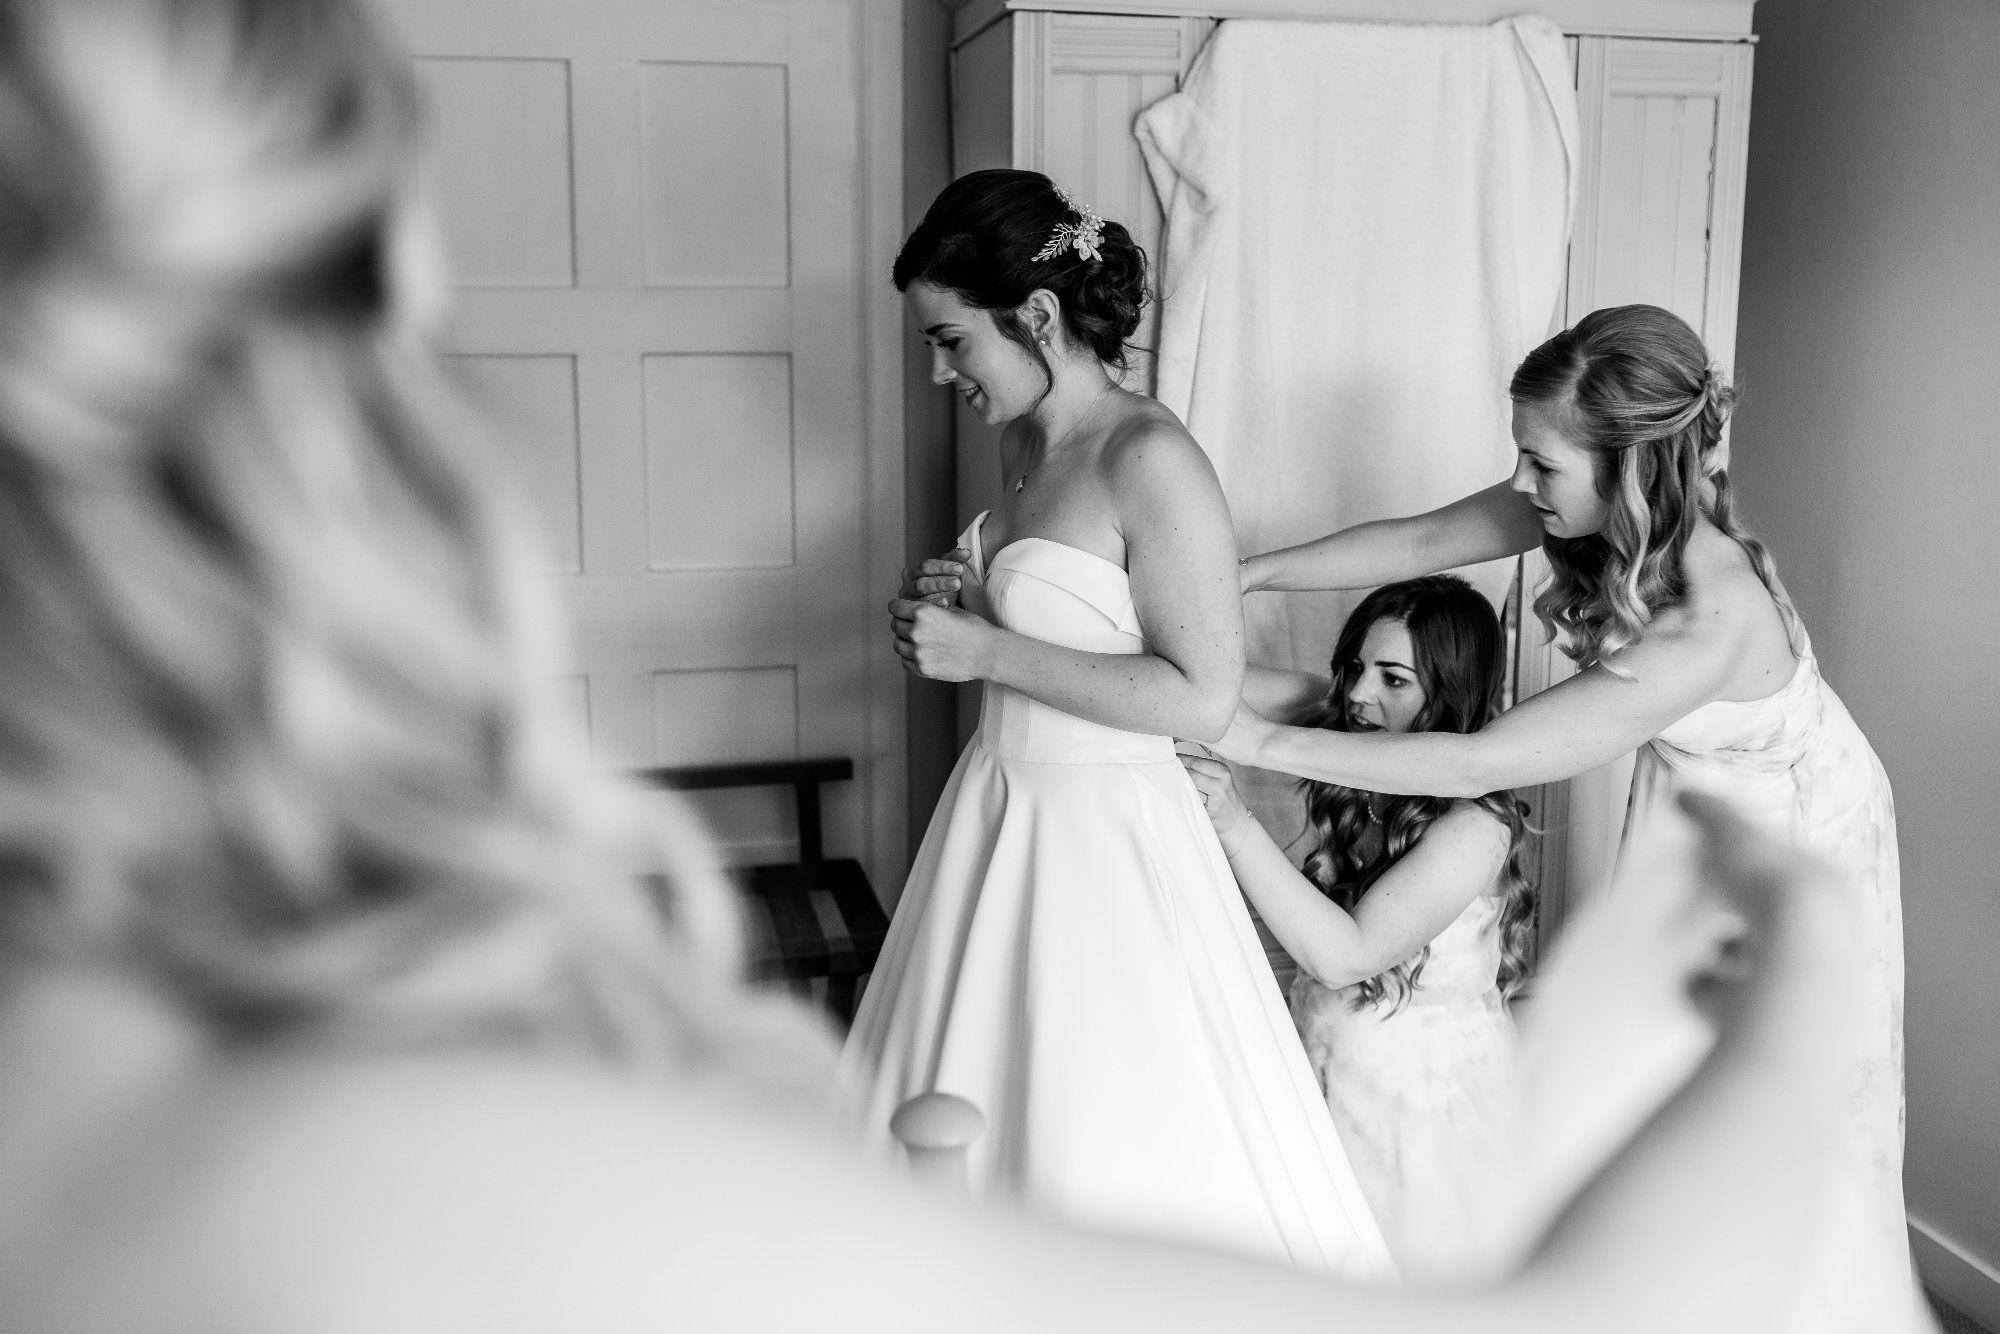 Personalised-bridal-wedding-&-occasion-headpiece-accessories-UK-KATHYRN19 (